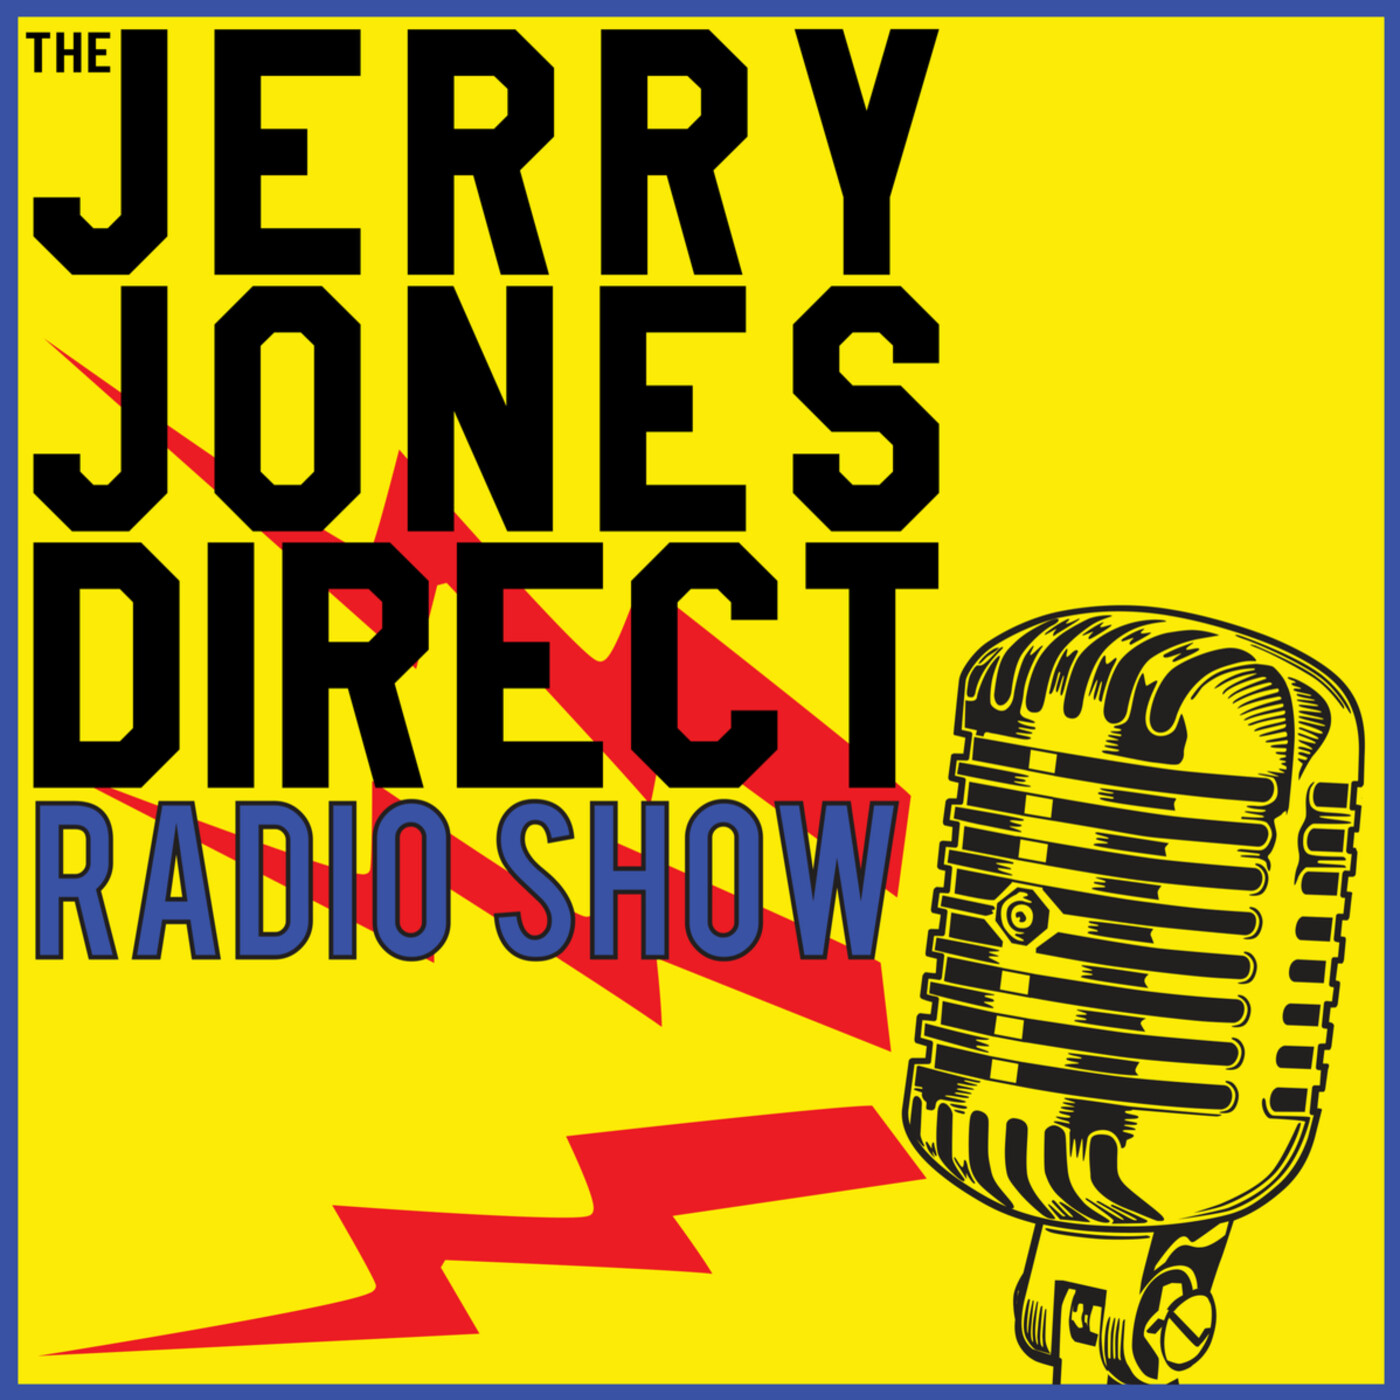 Episode #66: Jerry interviews Practice Management Consultant, Lisa Mellick